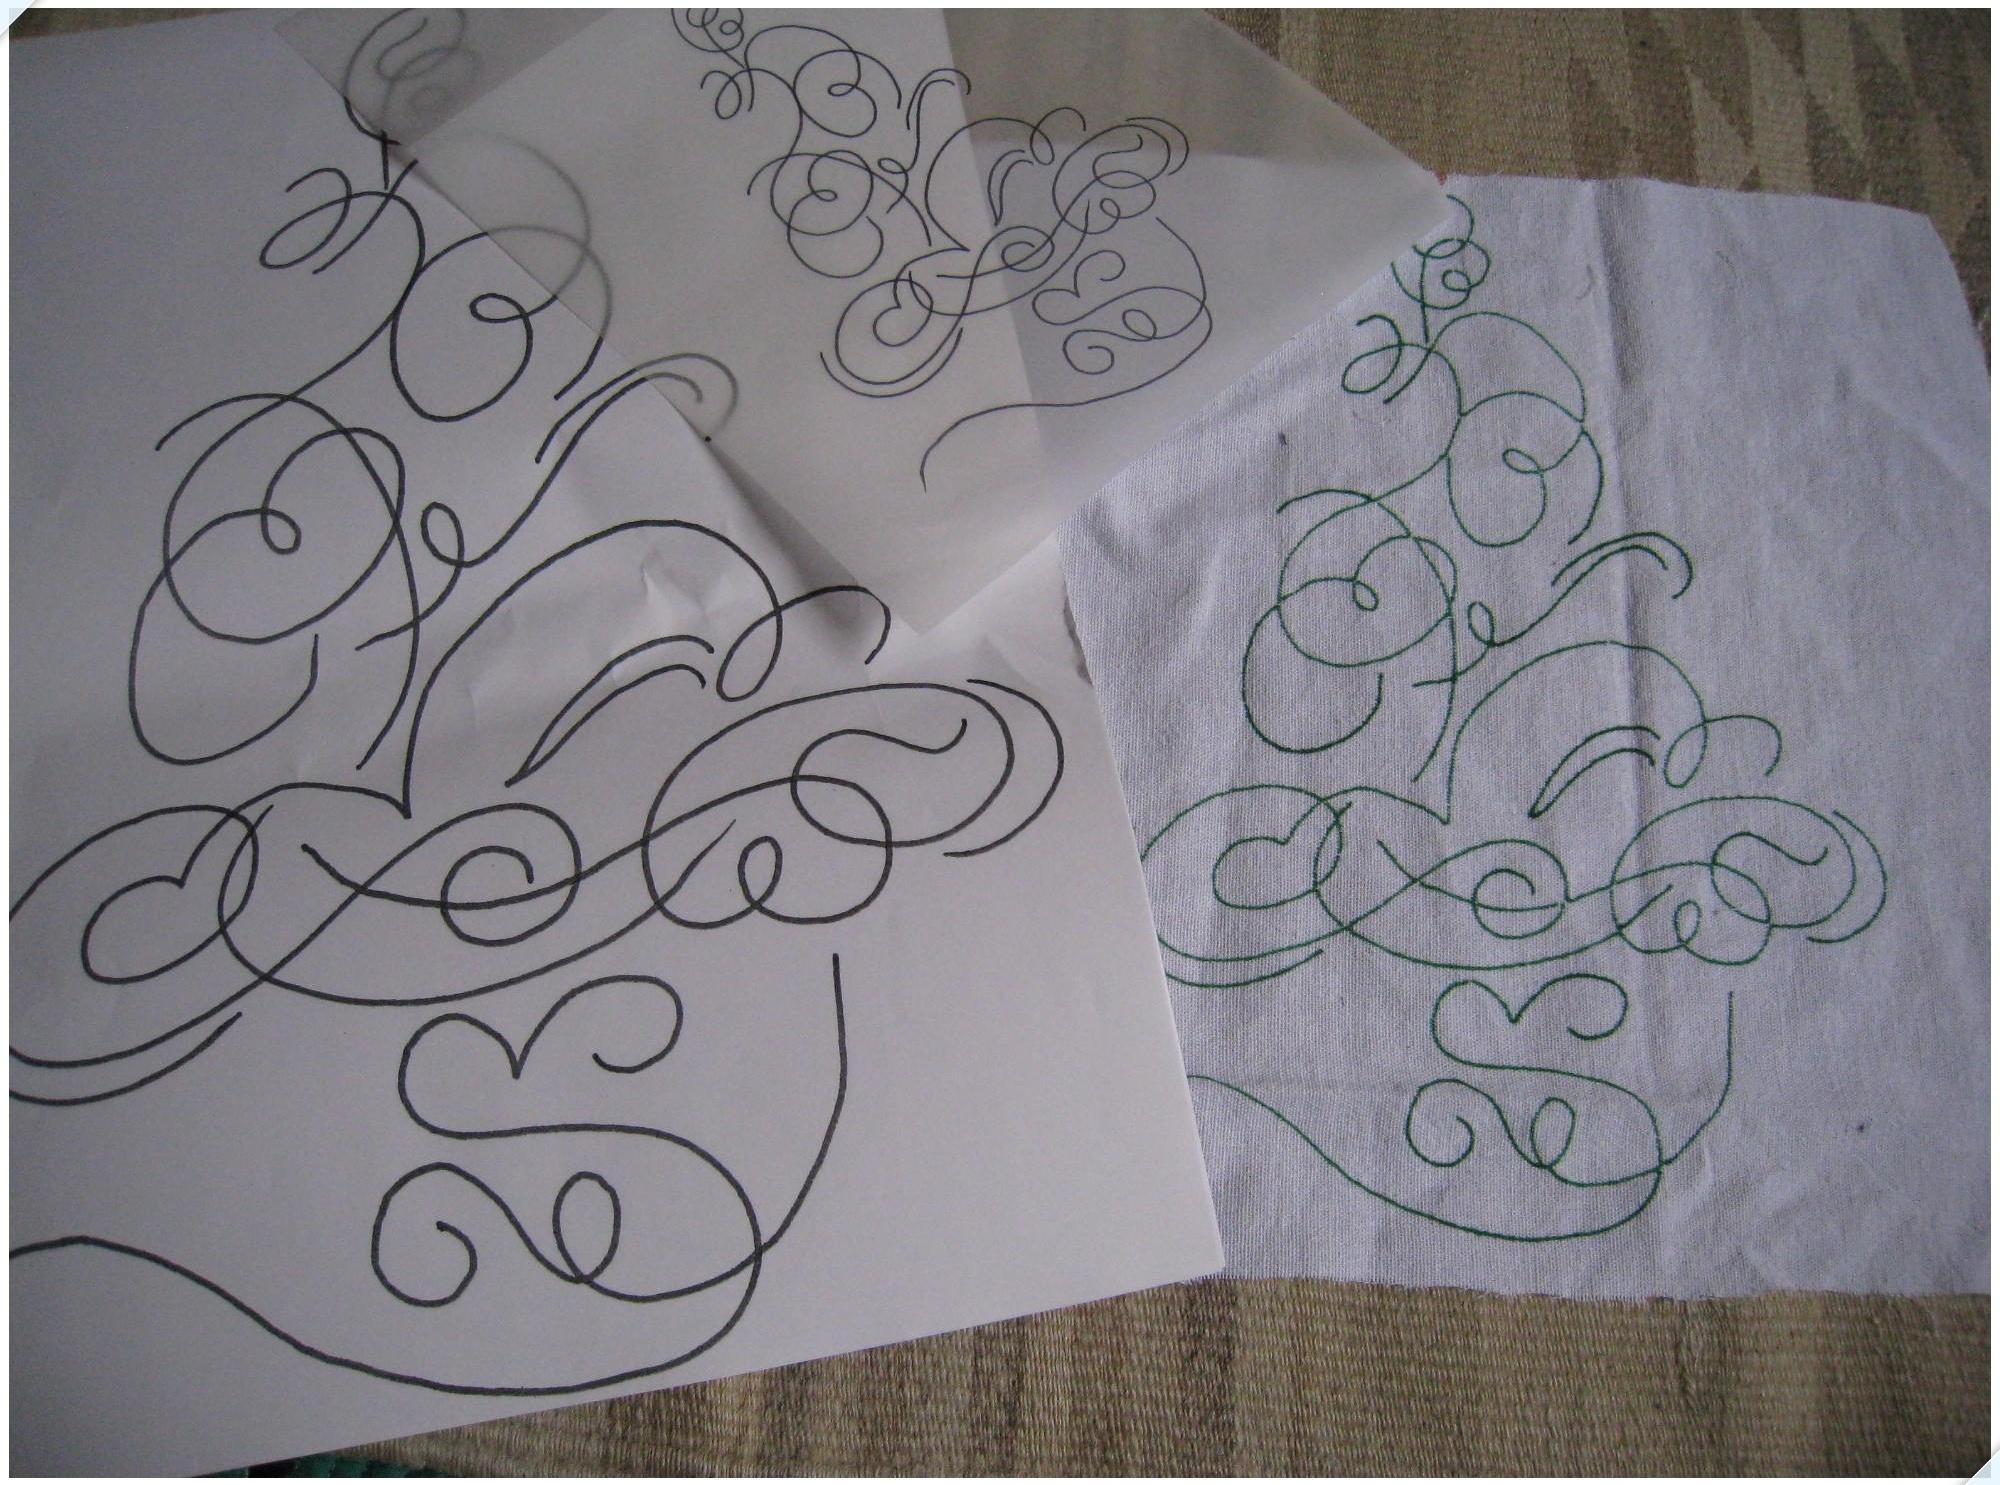 drawing_1_1009.jpg